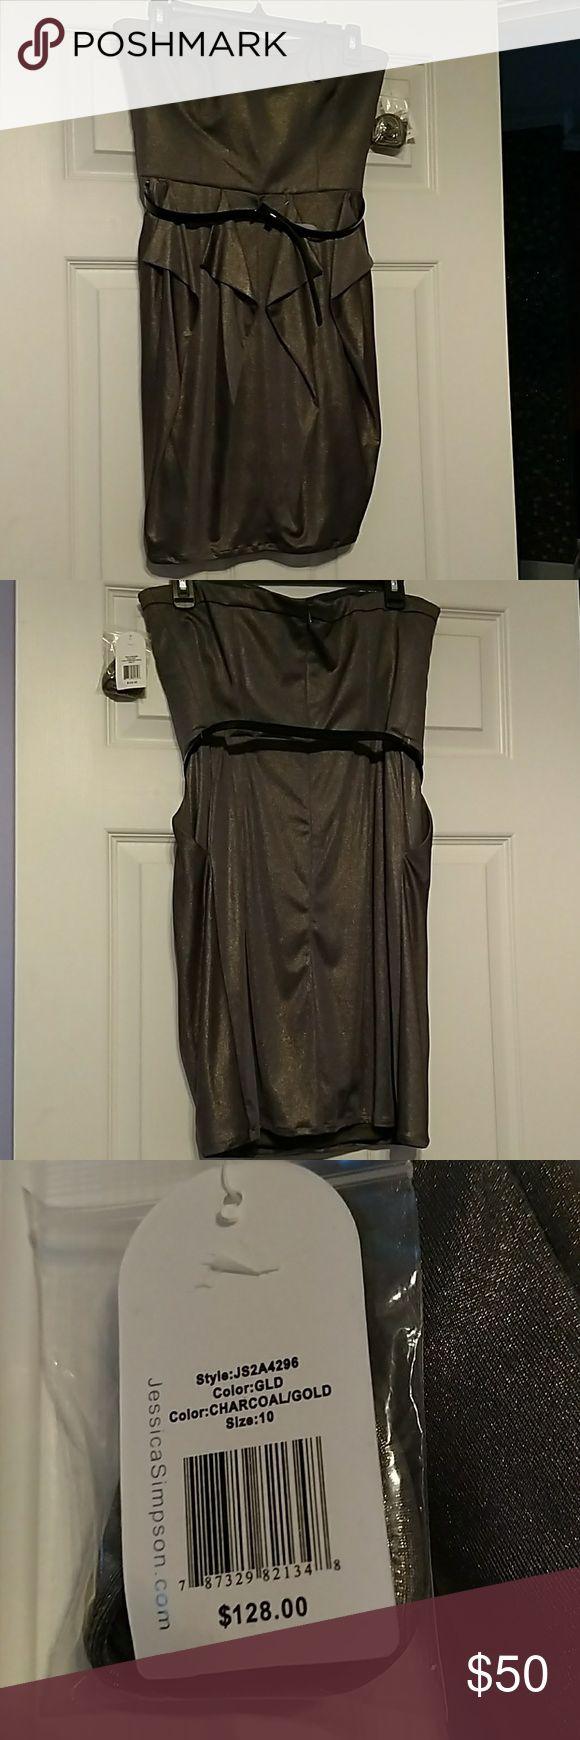 Jessica Simpson Strapless Dress NWT Silver Jessica Simpson dress with attachable straps. Dress has pockets! Jessica Simpson Dresses Mini